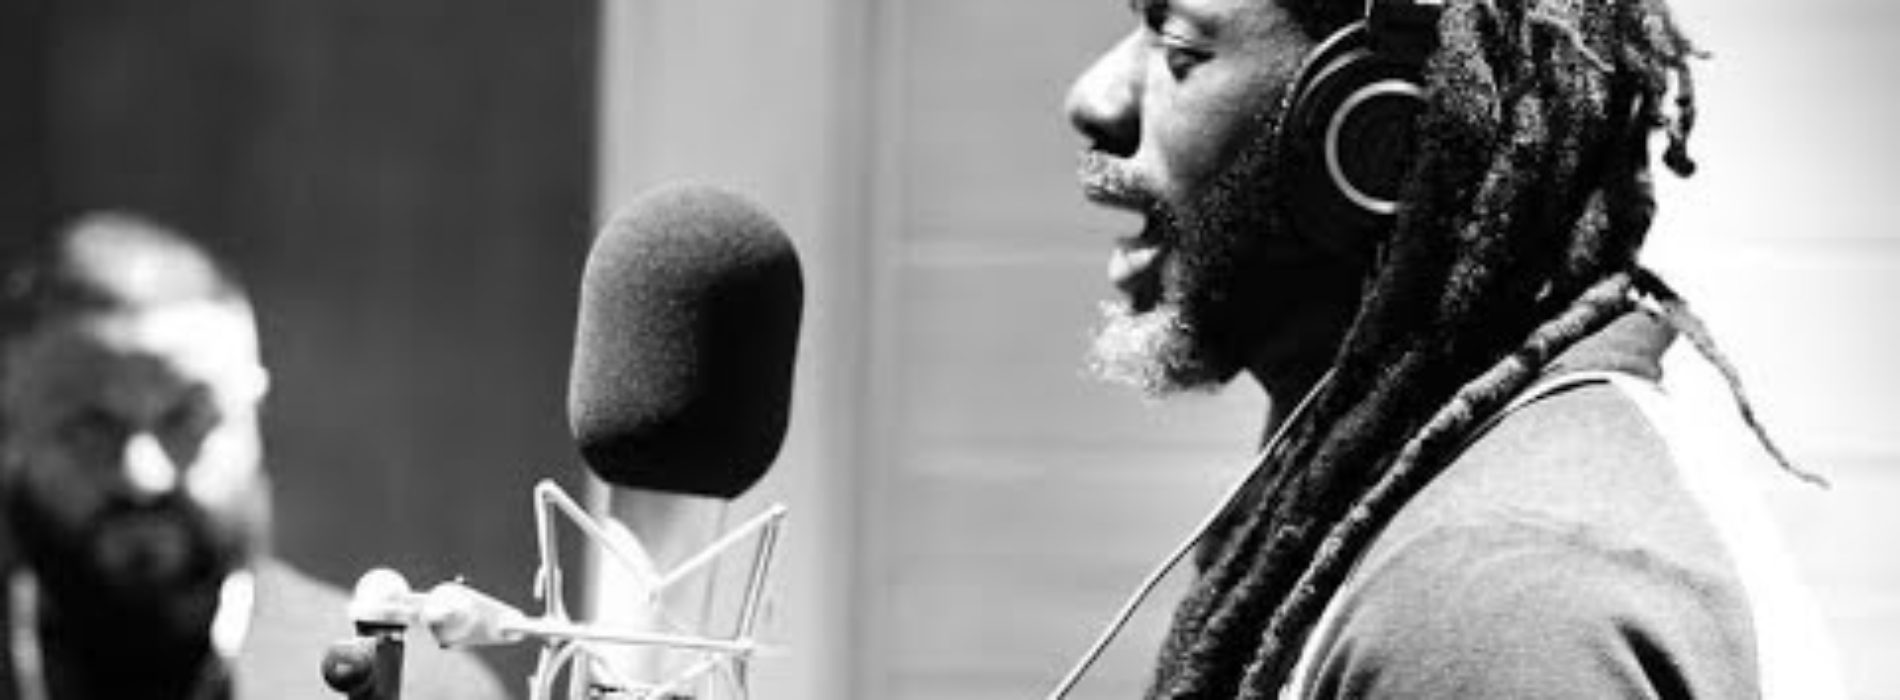 Buju Banton – Pay The Price (Audio) – Décembre 2018